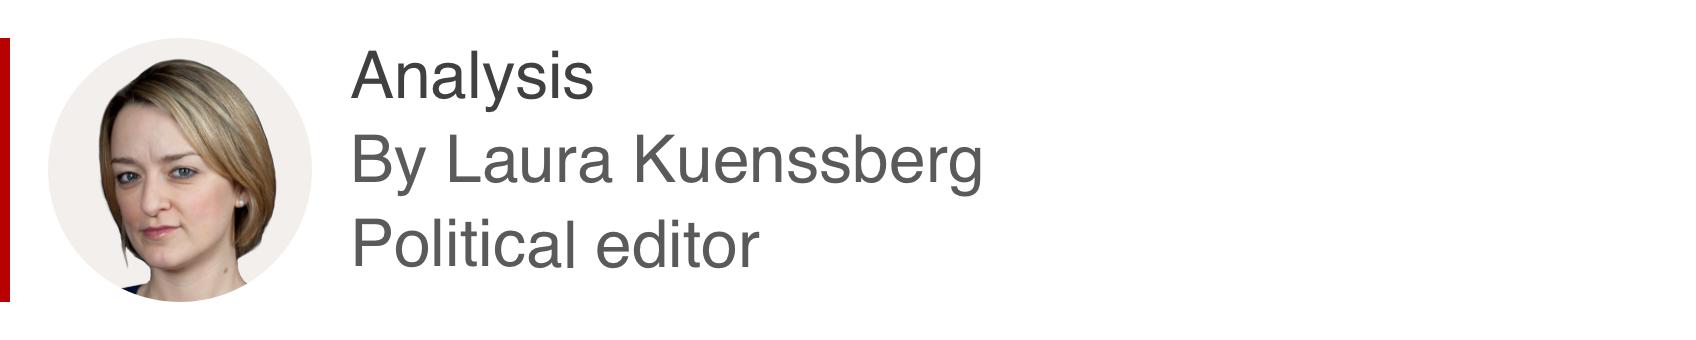 Analysis box by Laura Kuenssberg, politics editor